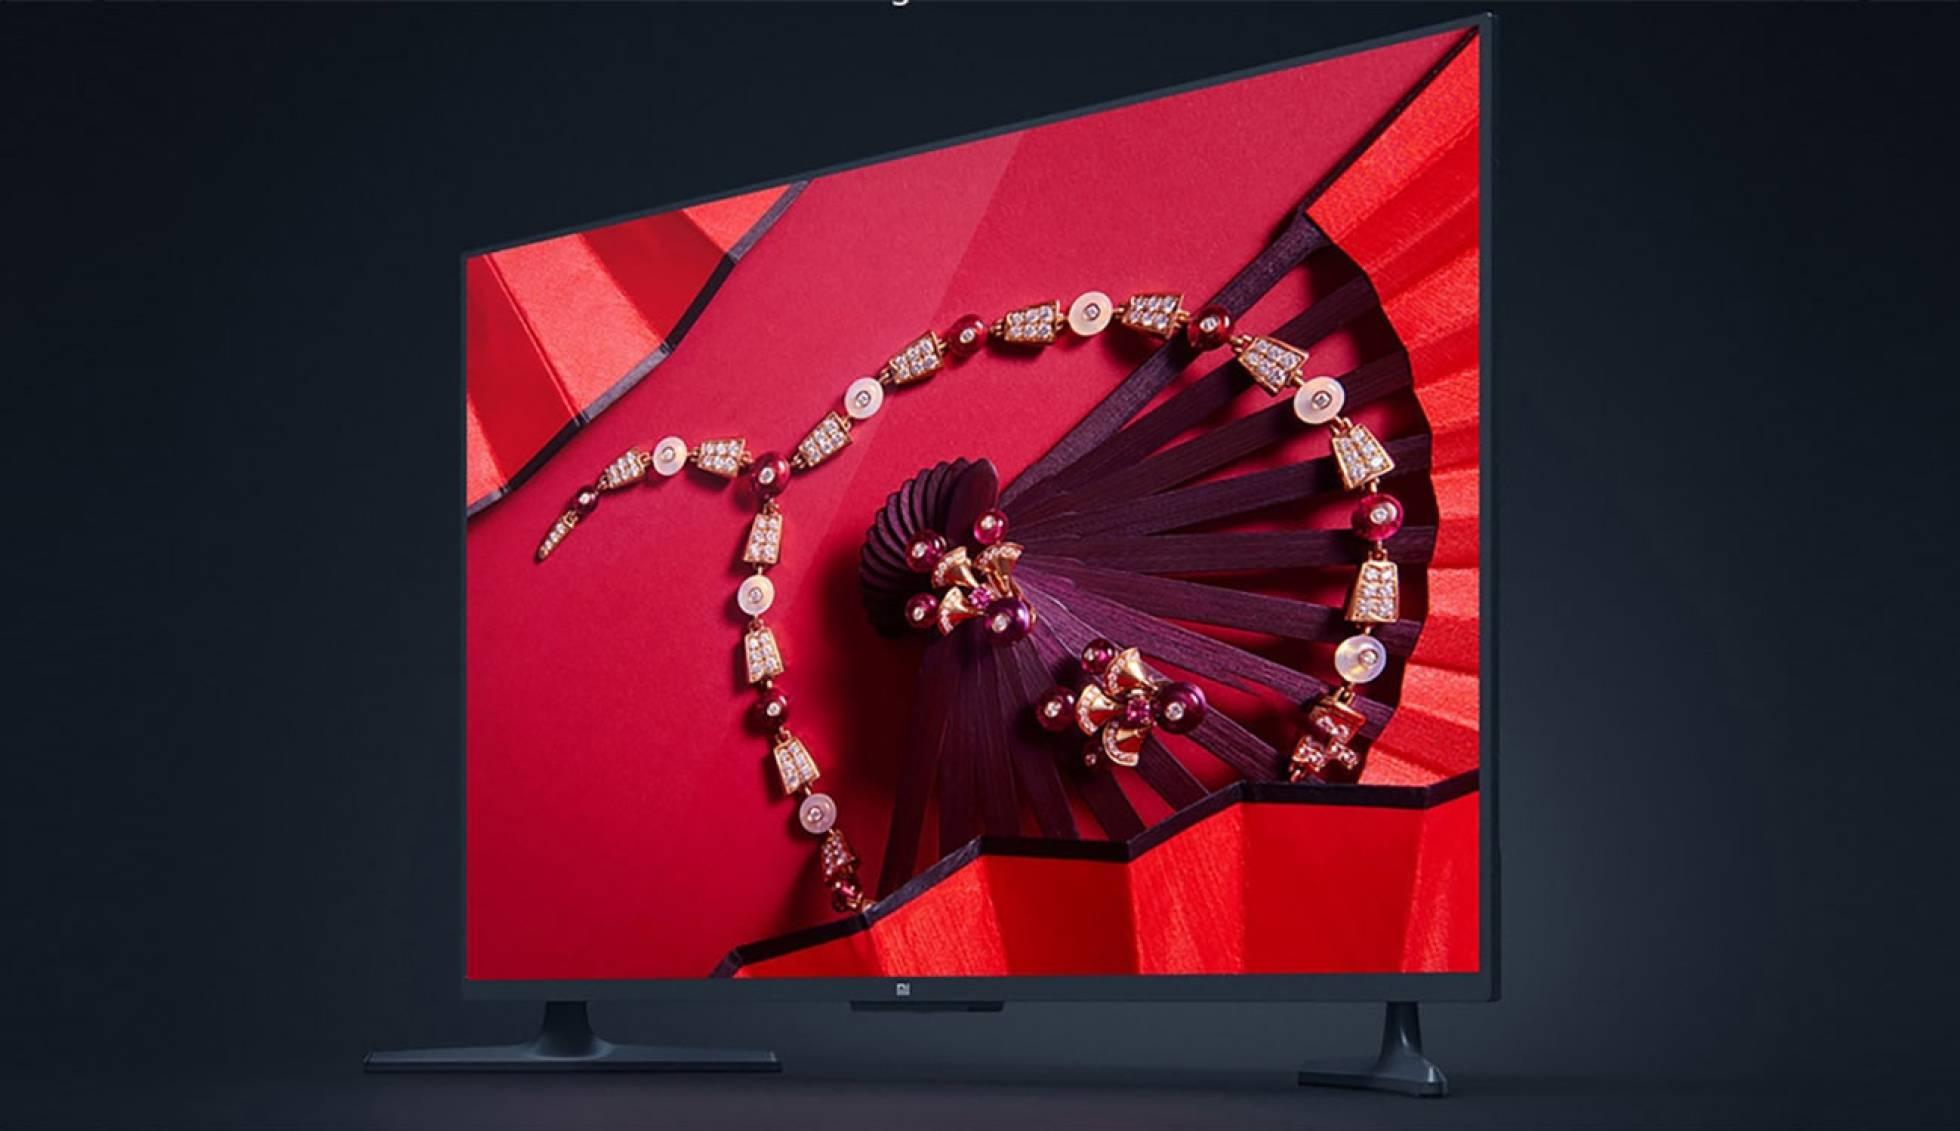 Xiaomi Mi Tv 4A de 50 pulgadas